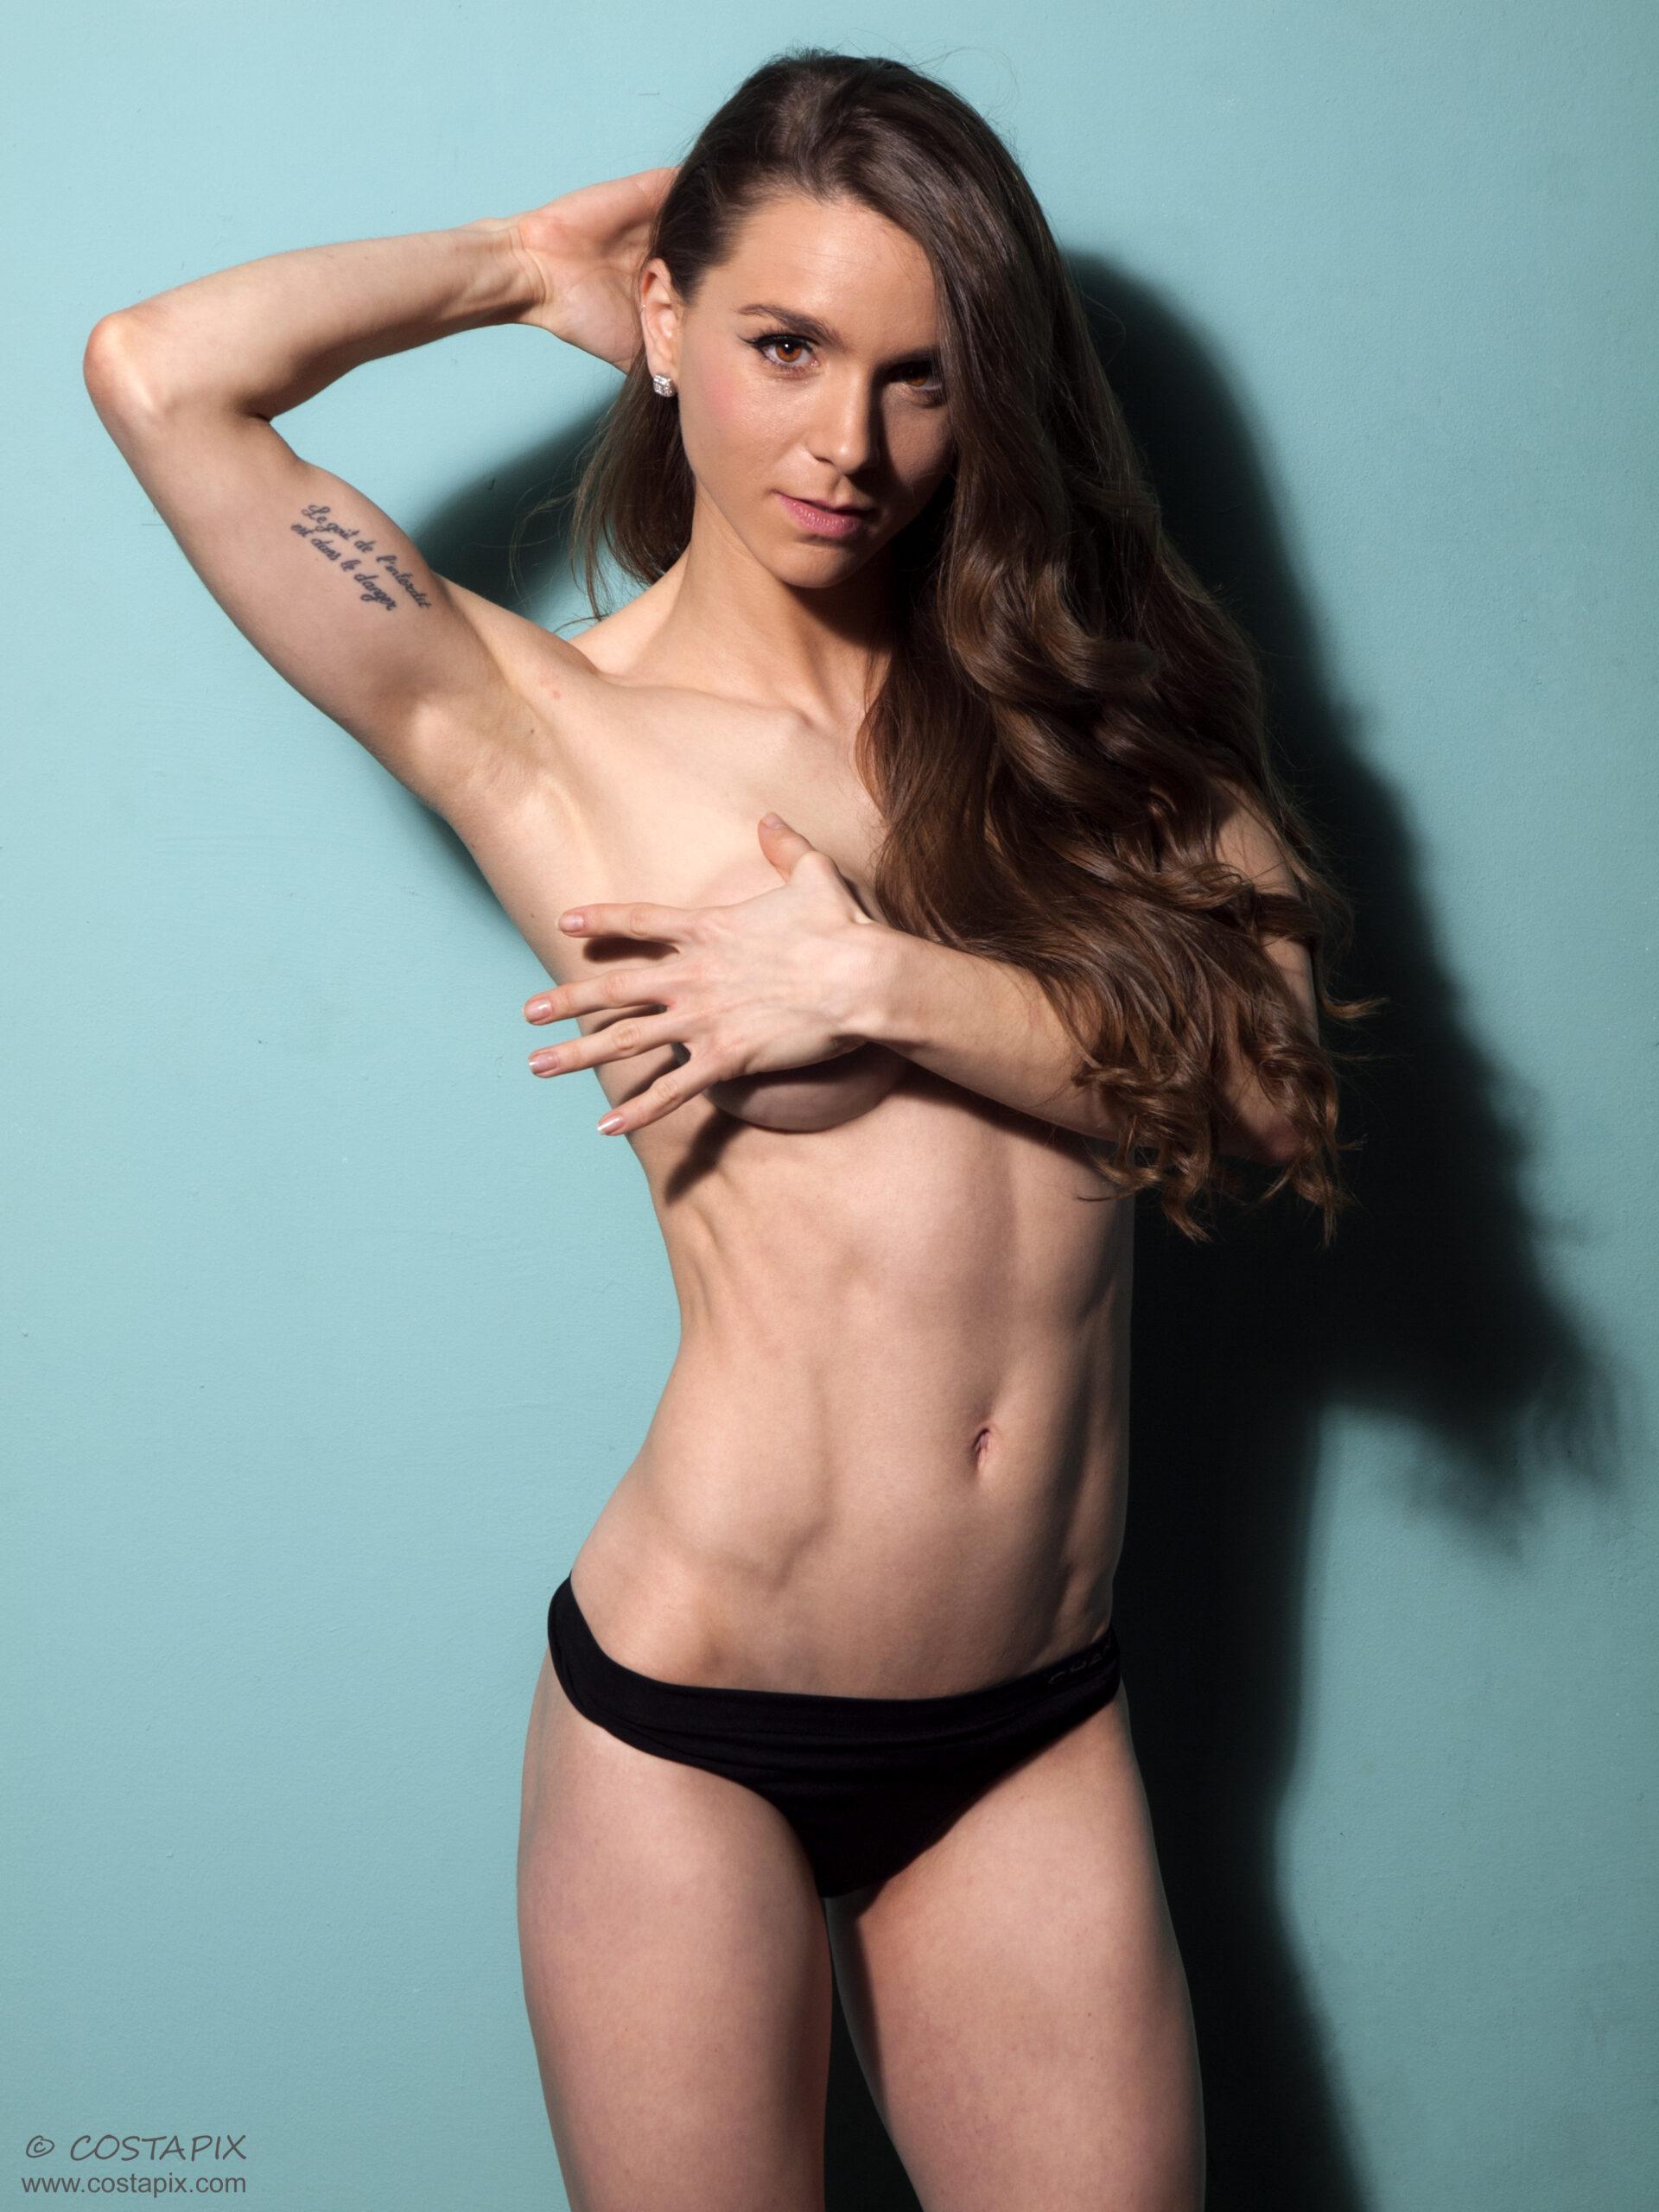 Steffi, fitness model in Costapix Studio